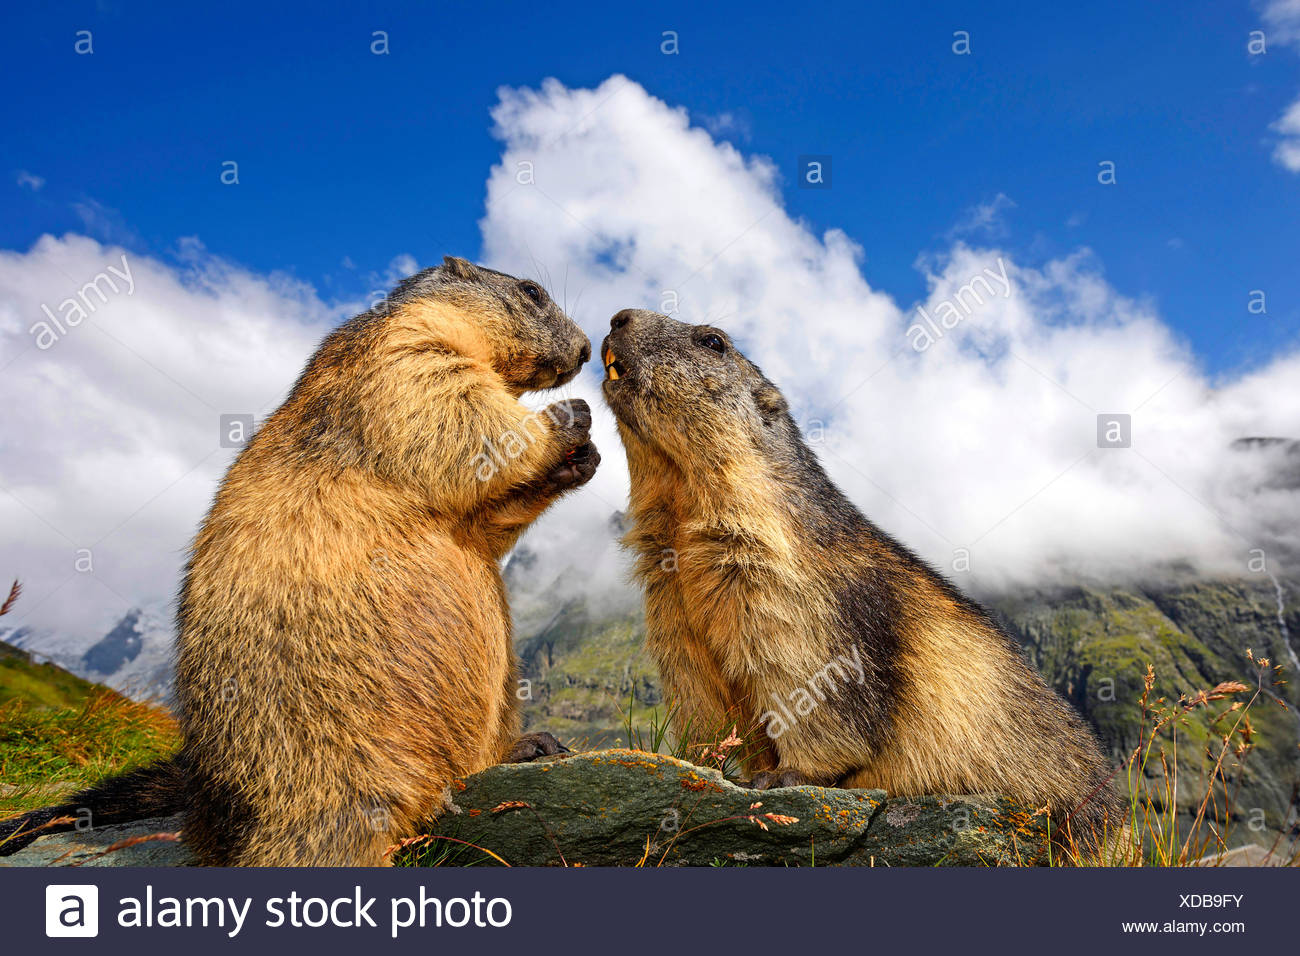 Alpenmurmeltier, Alpen-Murmeltier (Marmota marmota), zwei Murmeltiere begruessen einander, Italien | alpine marmotta (Marmota marm Immagini Stock